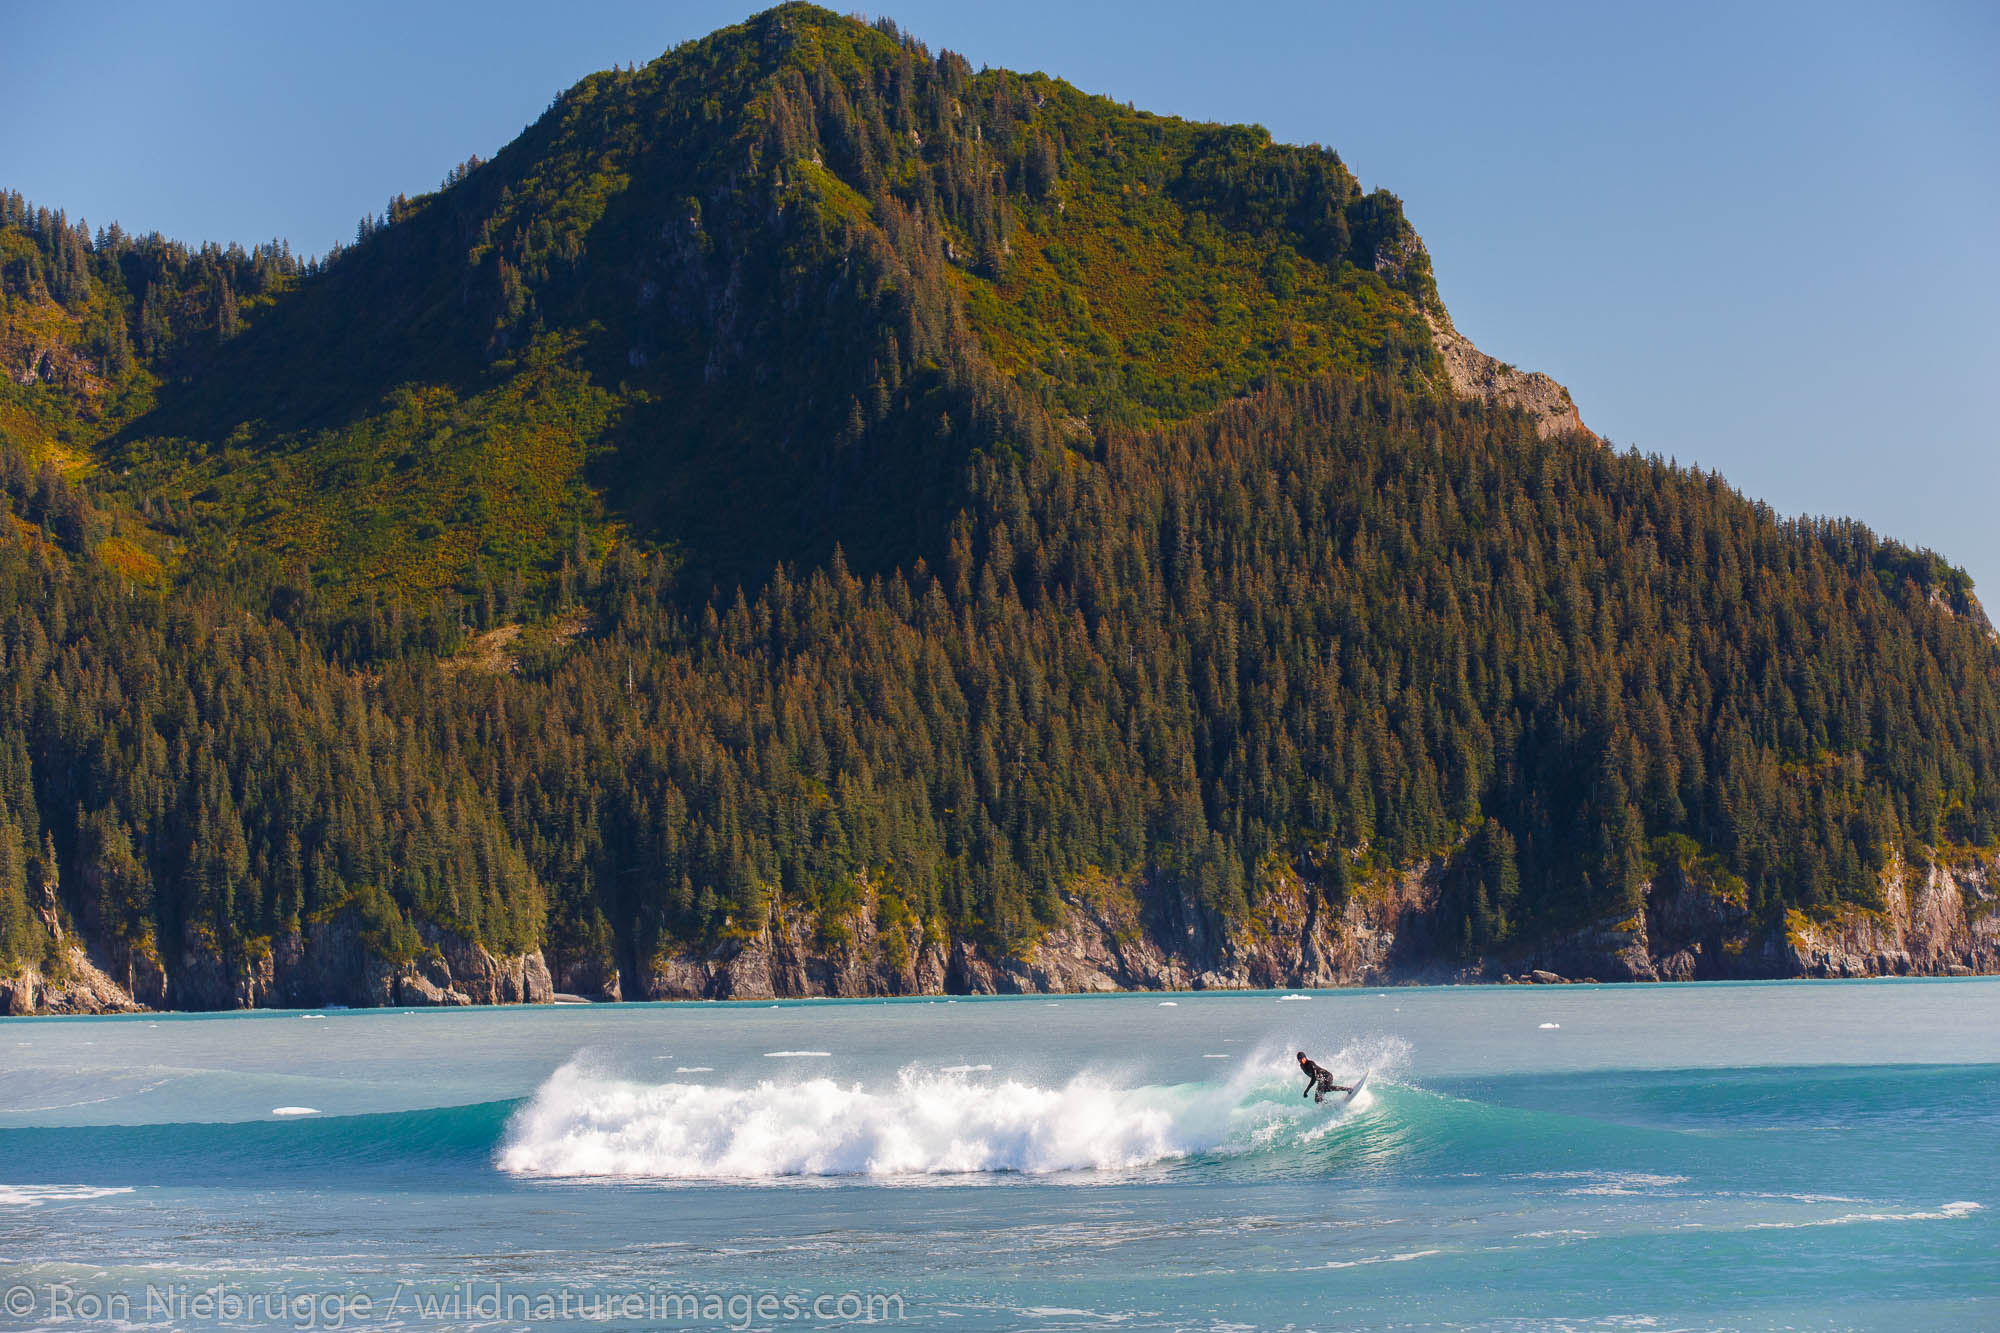 Surfing in front of Bear Glacier Lagoon, Kenai Fjords National Park, near Seward, Alaska.